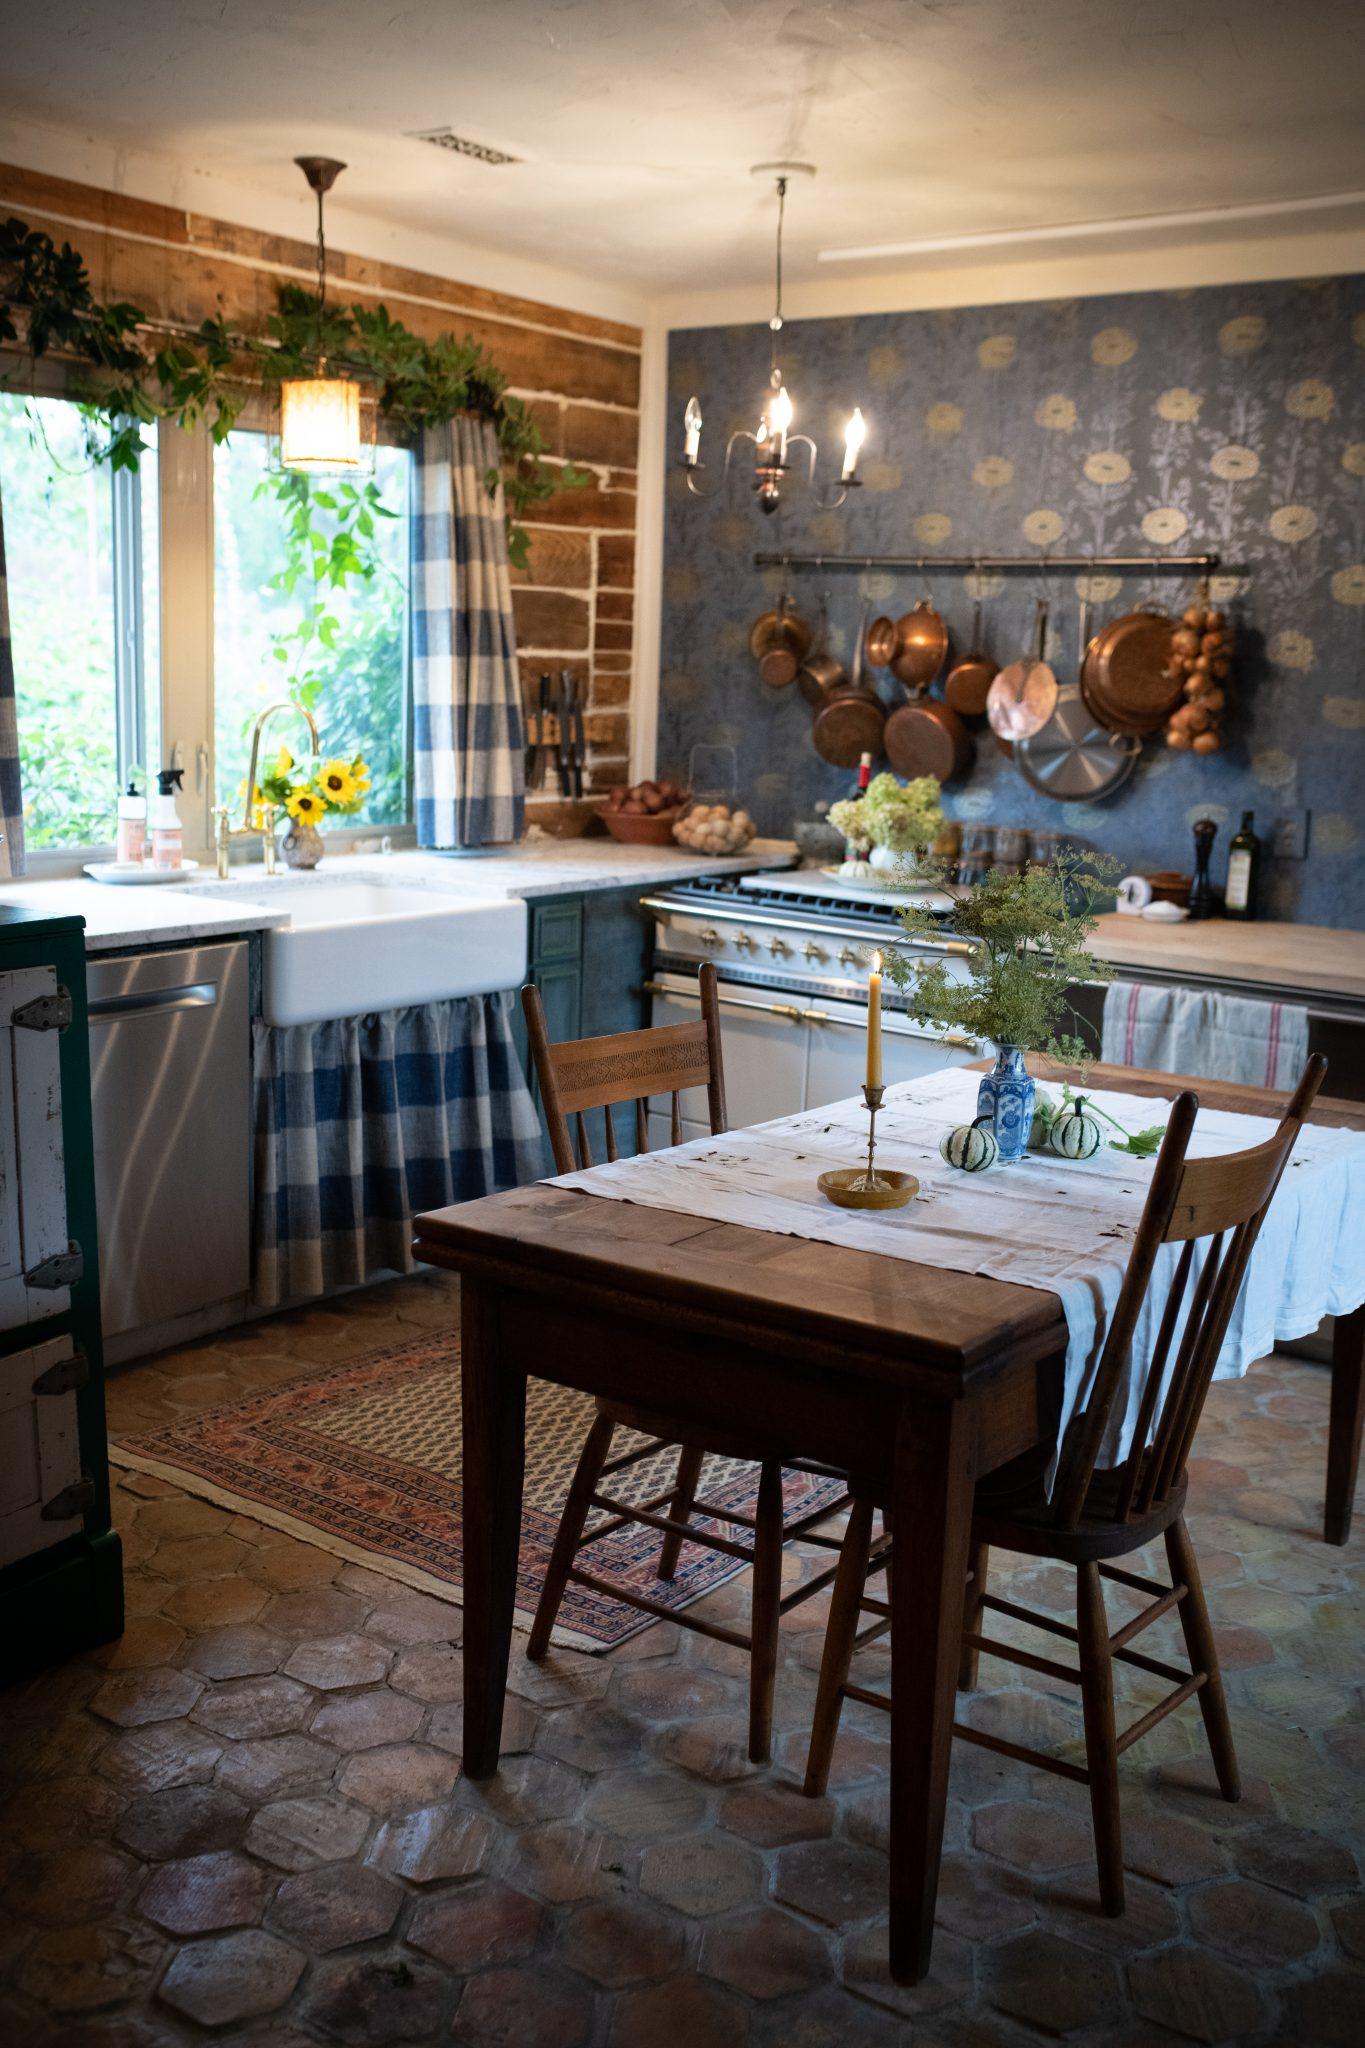 Not a victim of my kitchen   The Elliott Homestead (.com)